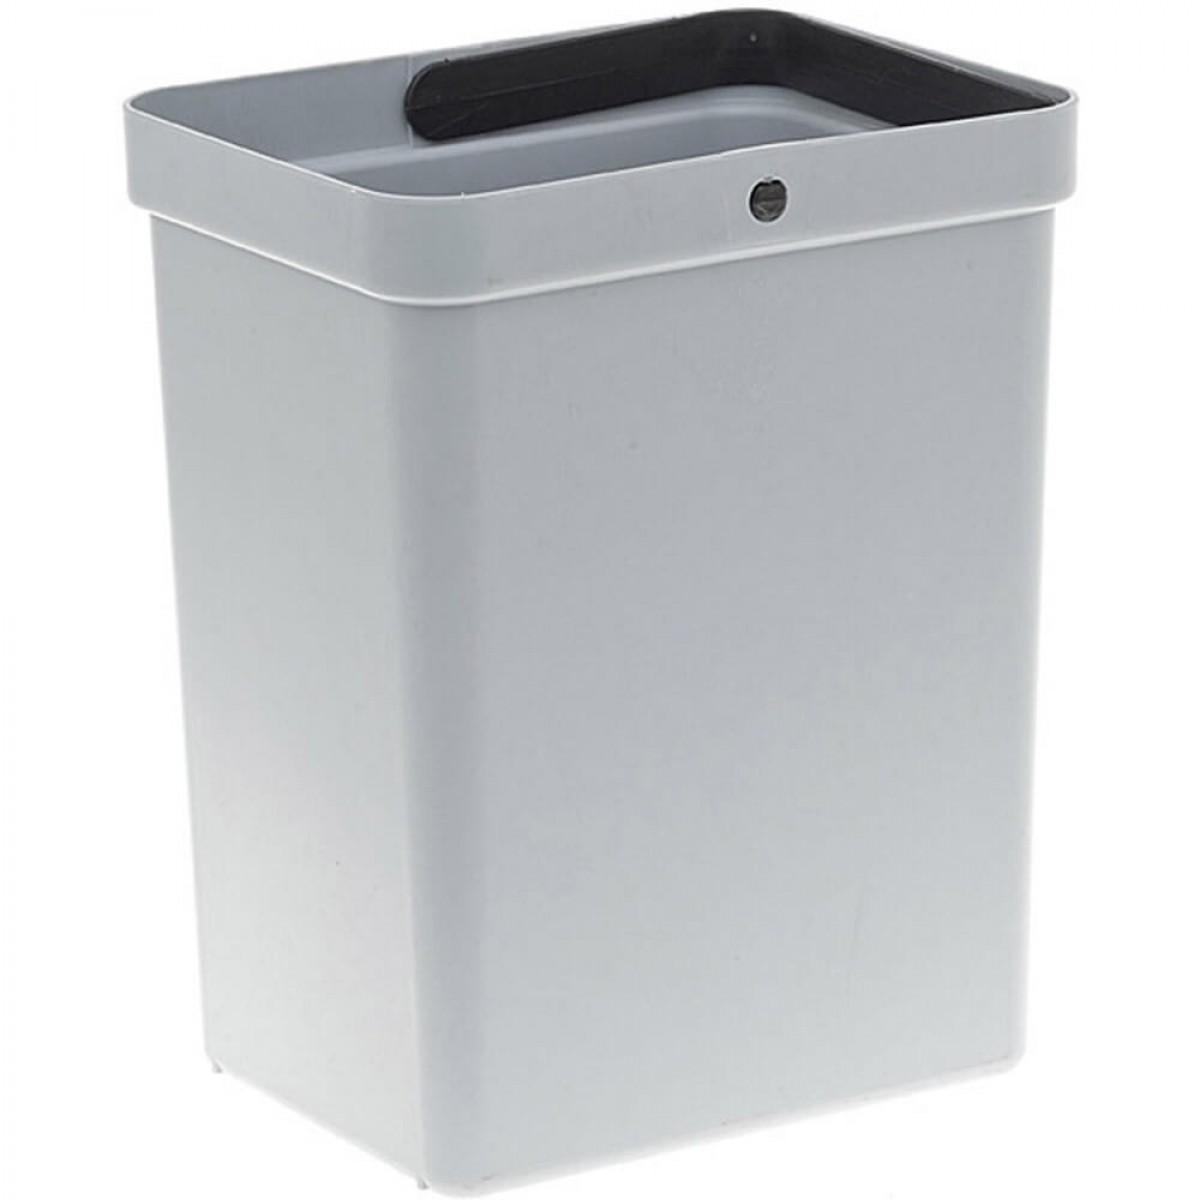 Affaldspand i grå plast - 10 ltr